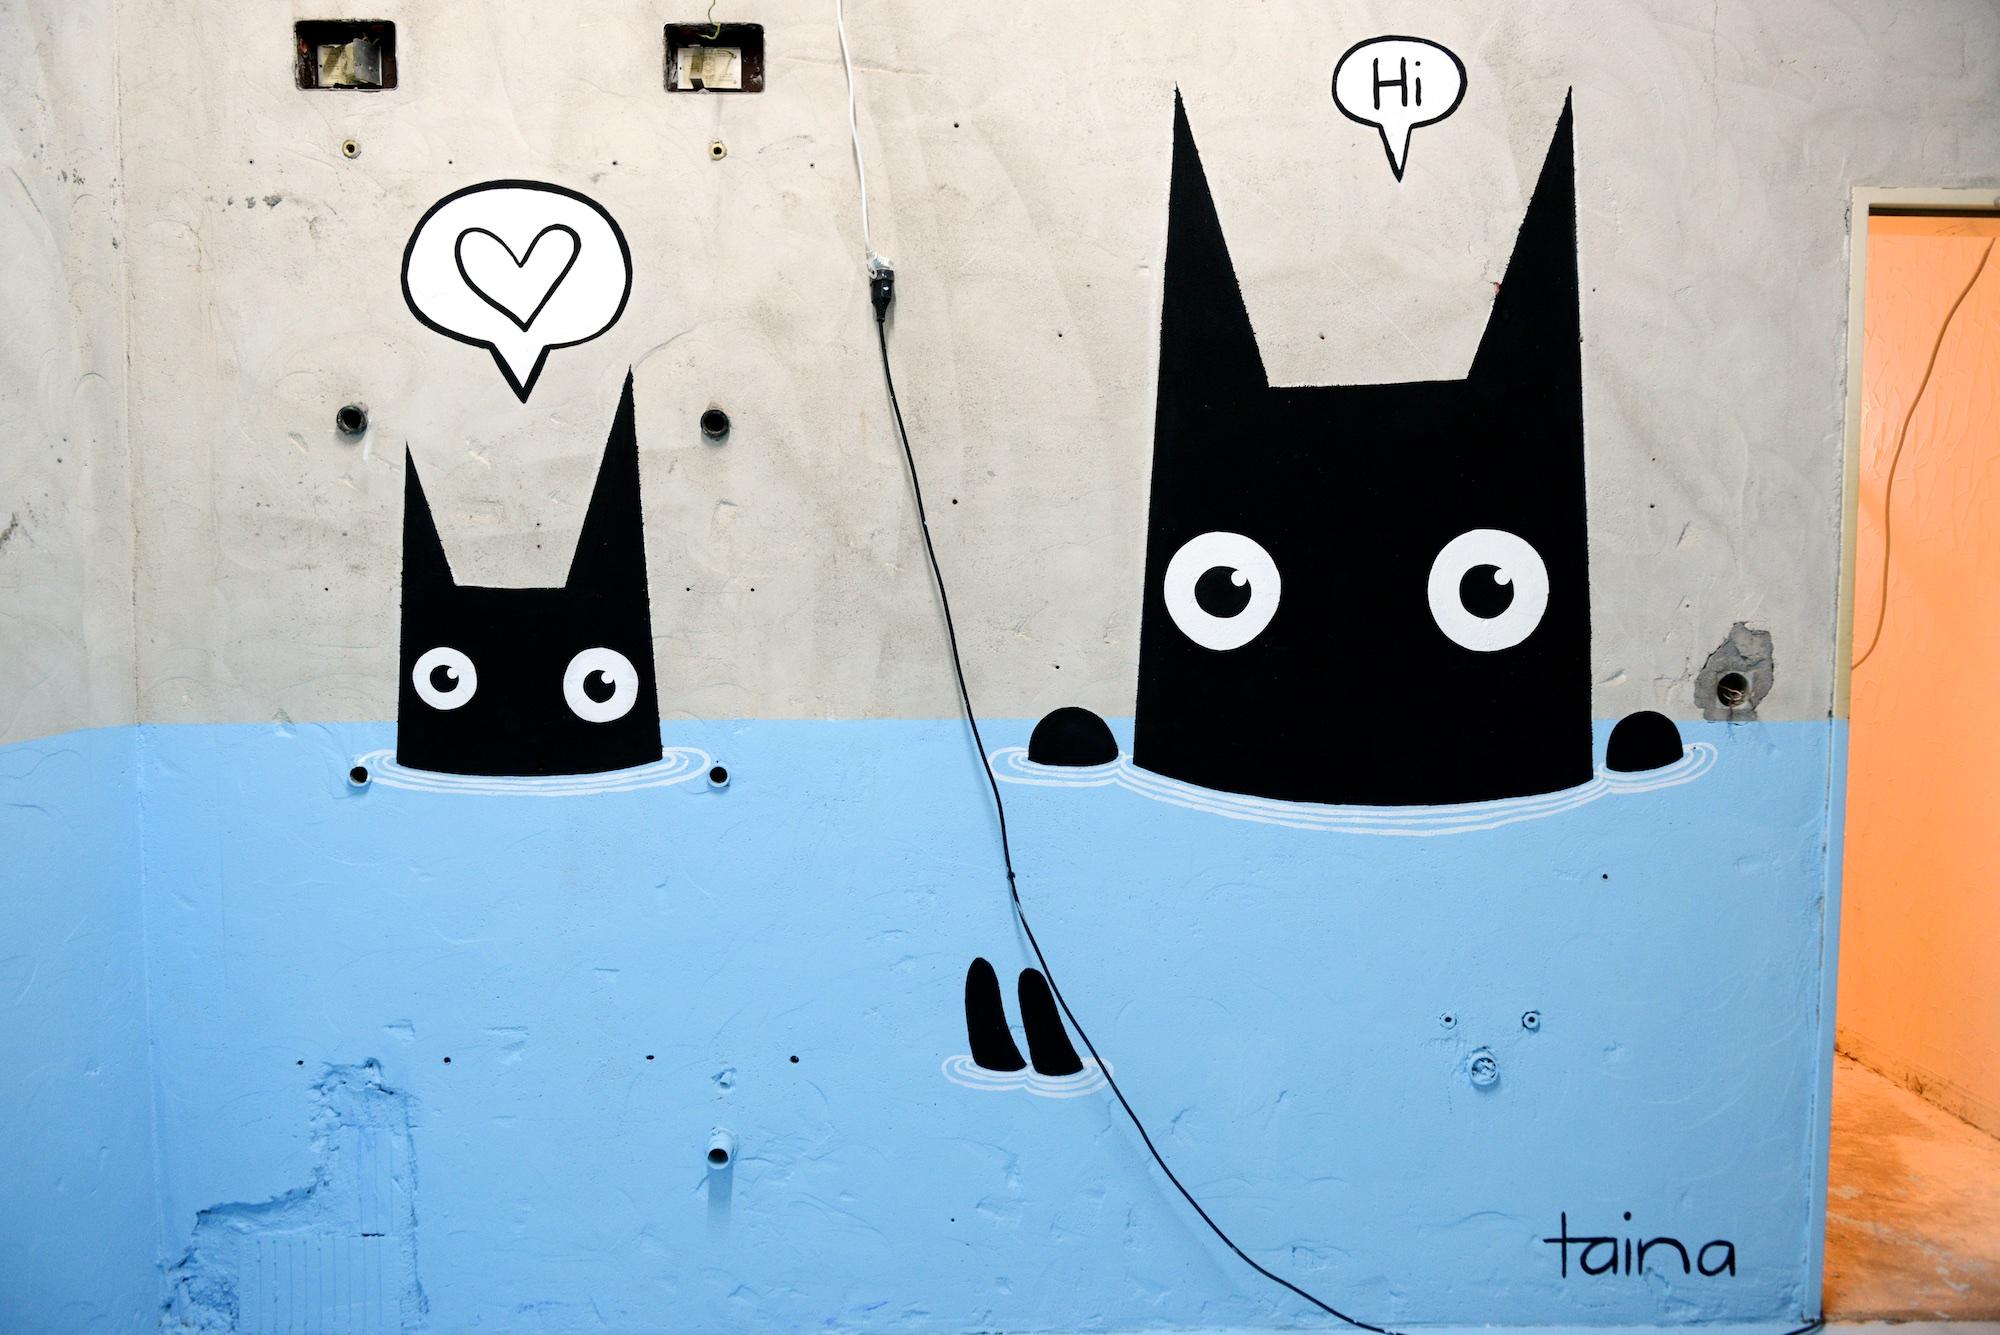 streetart.limited 2014